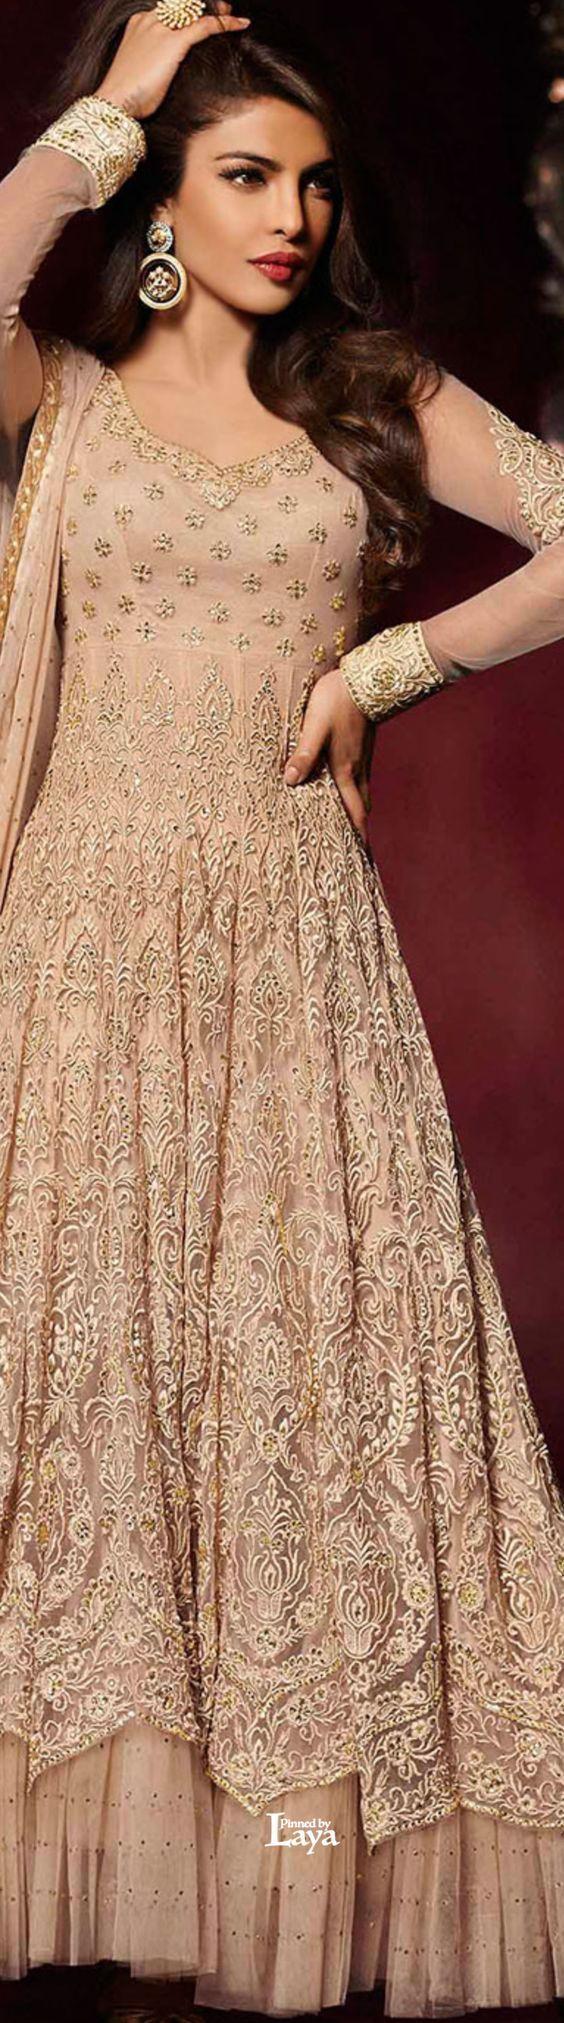 Stylish white dress wedding umbrella frocks churidar designs - Indian Asian Umbrella Frocks Collection 2016 2017 Fashion 2016 For Girls Fashion3style Com Frocks Pinterest Frocks